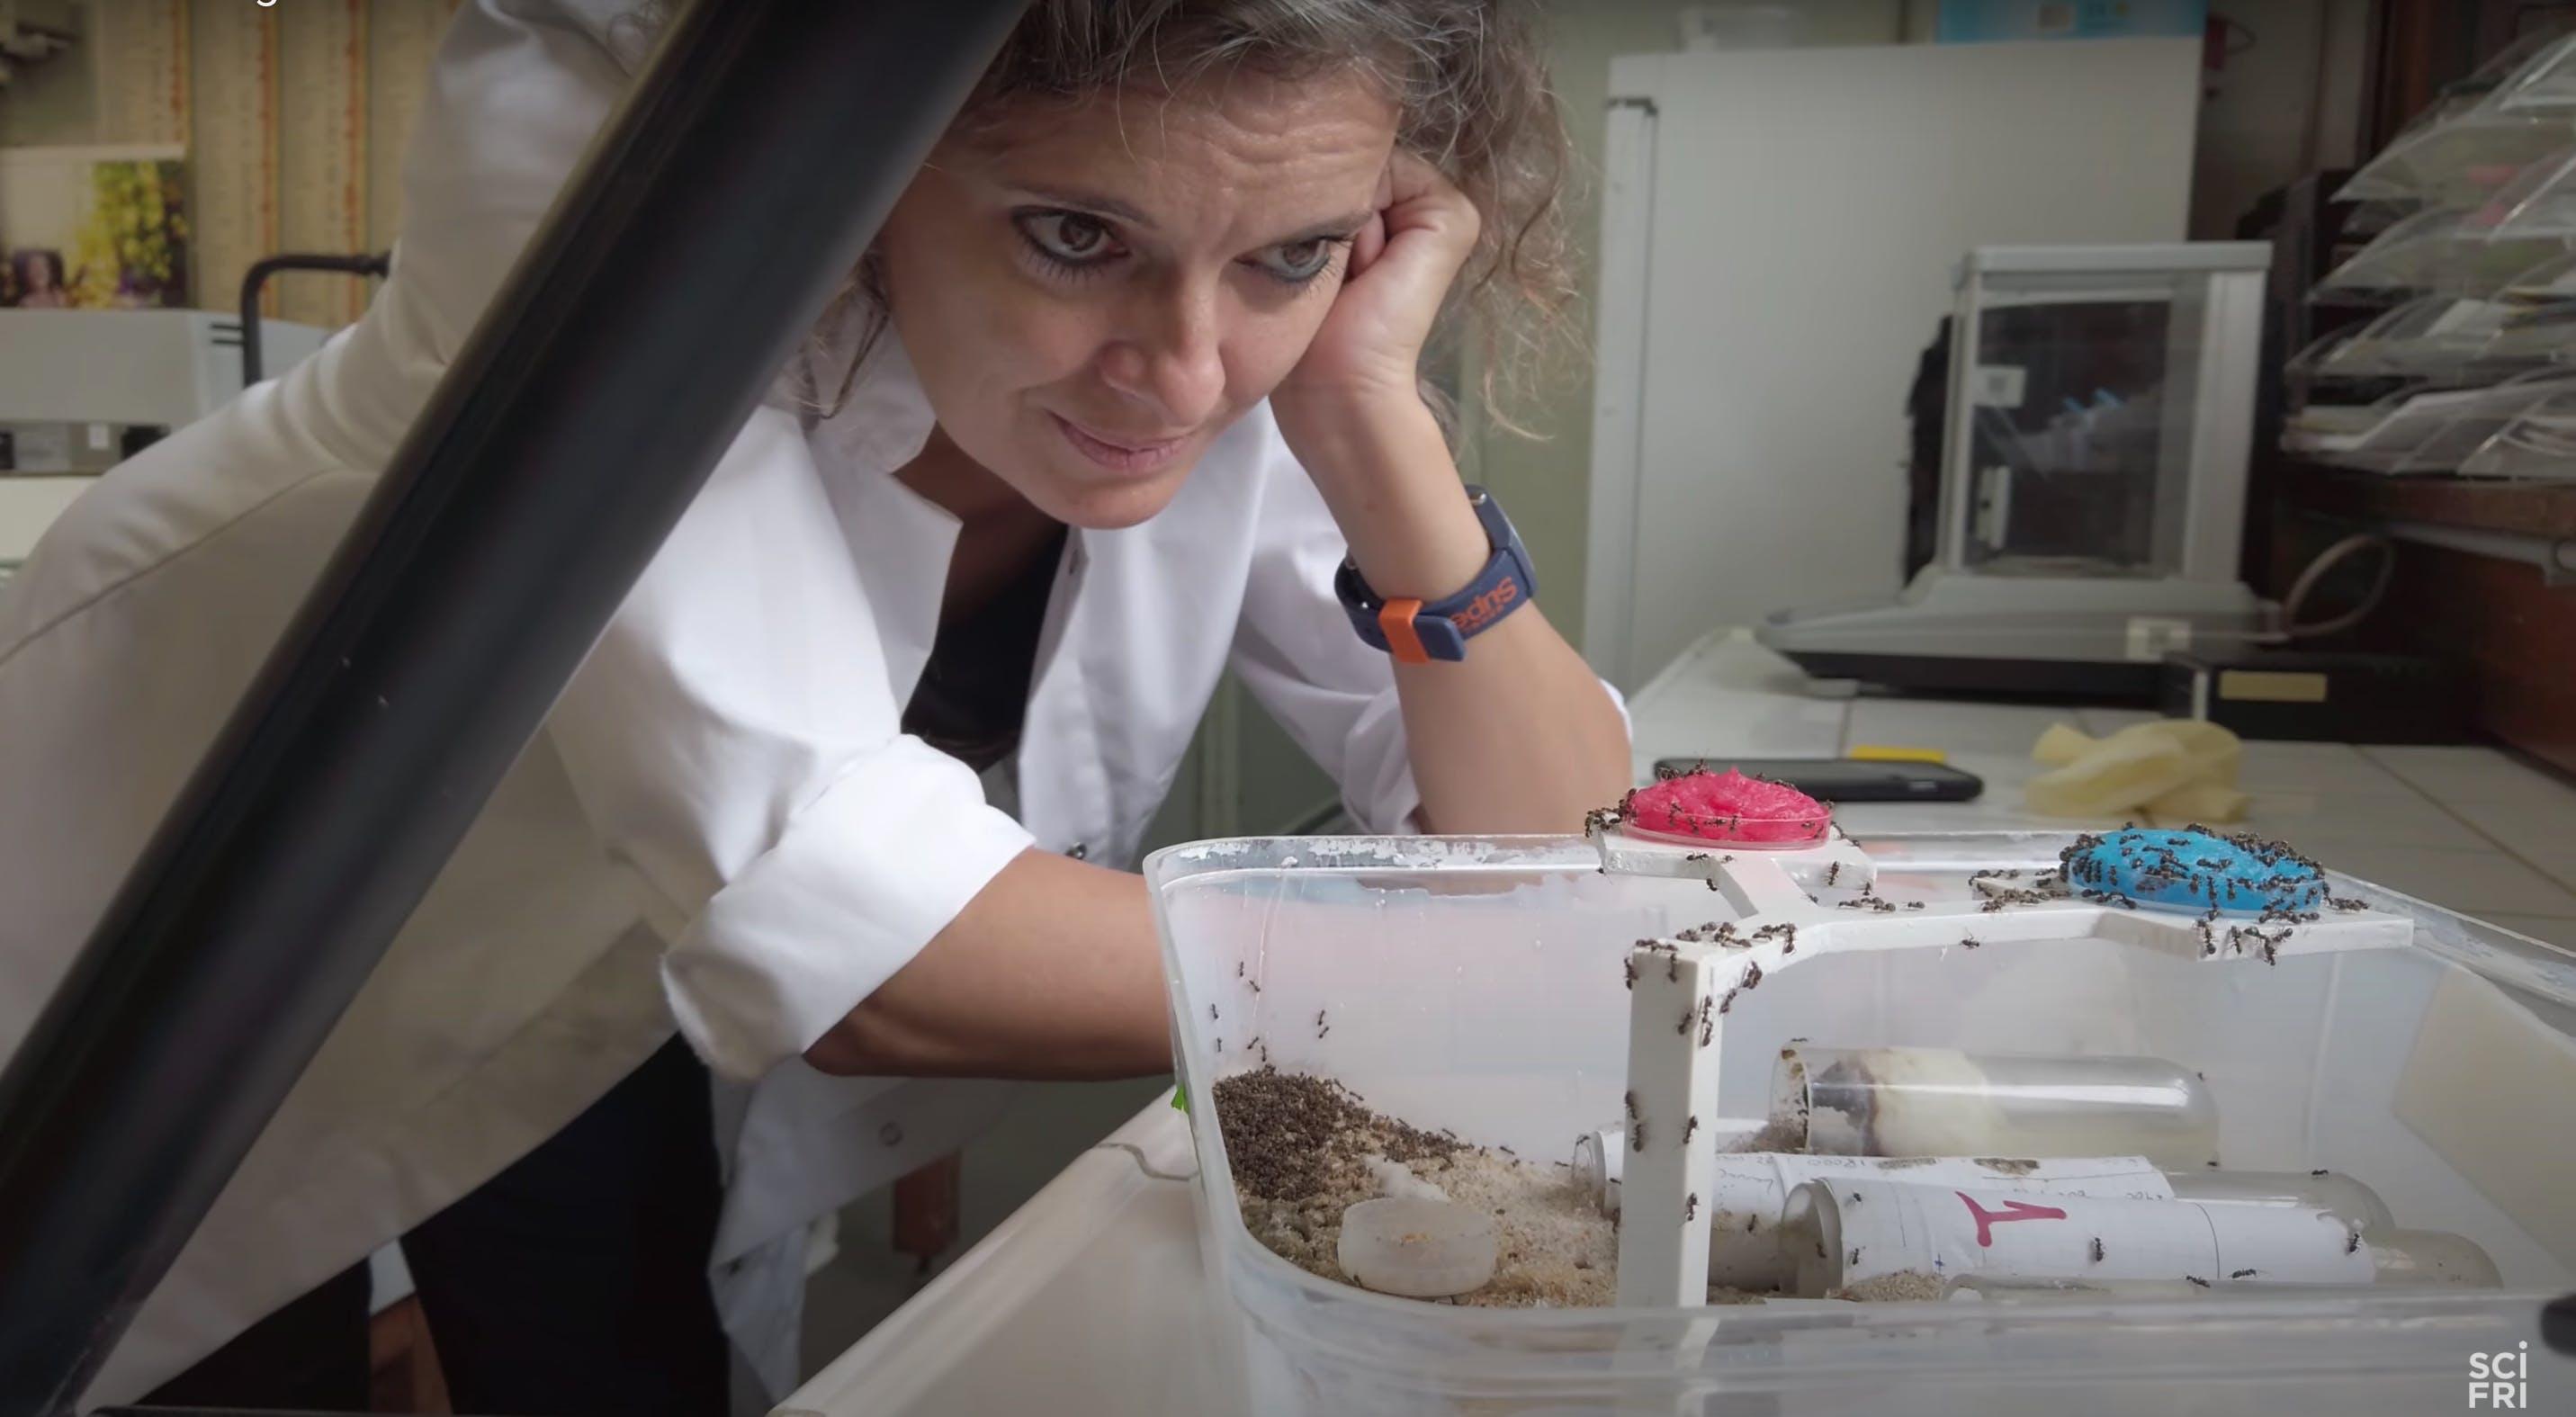 Dussutour observes an ant experiment